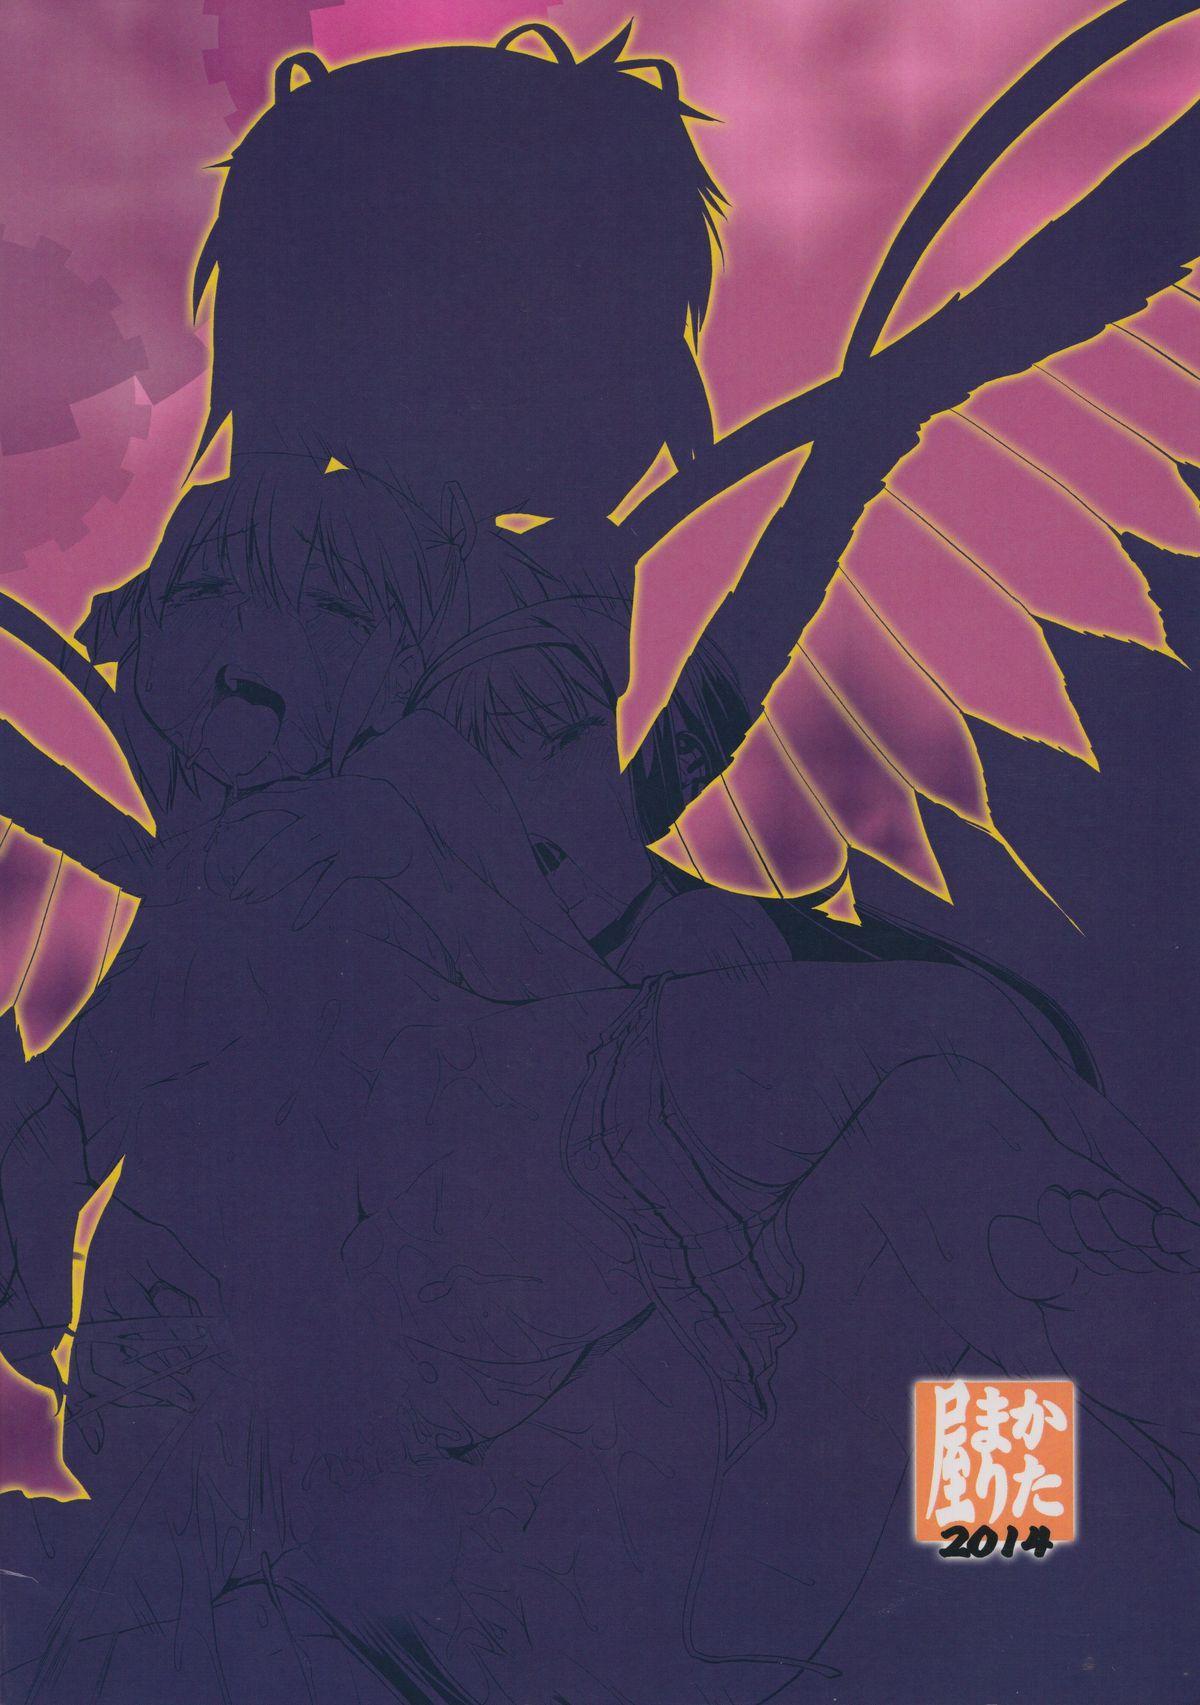 (C86) [KATAMARI-YA (Kanetsuki Masayoshi, Shinama) DevilAX (Puella Magi Madoka Magica) 1